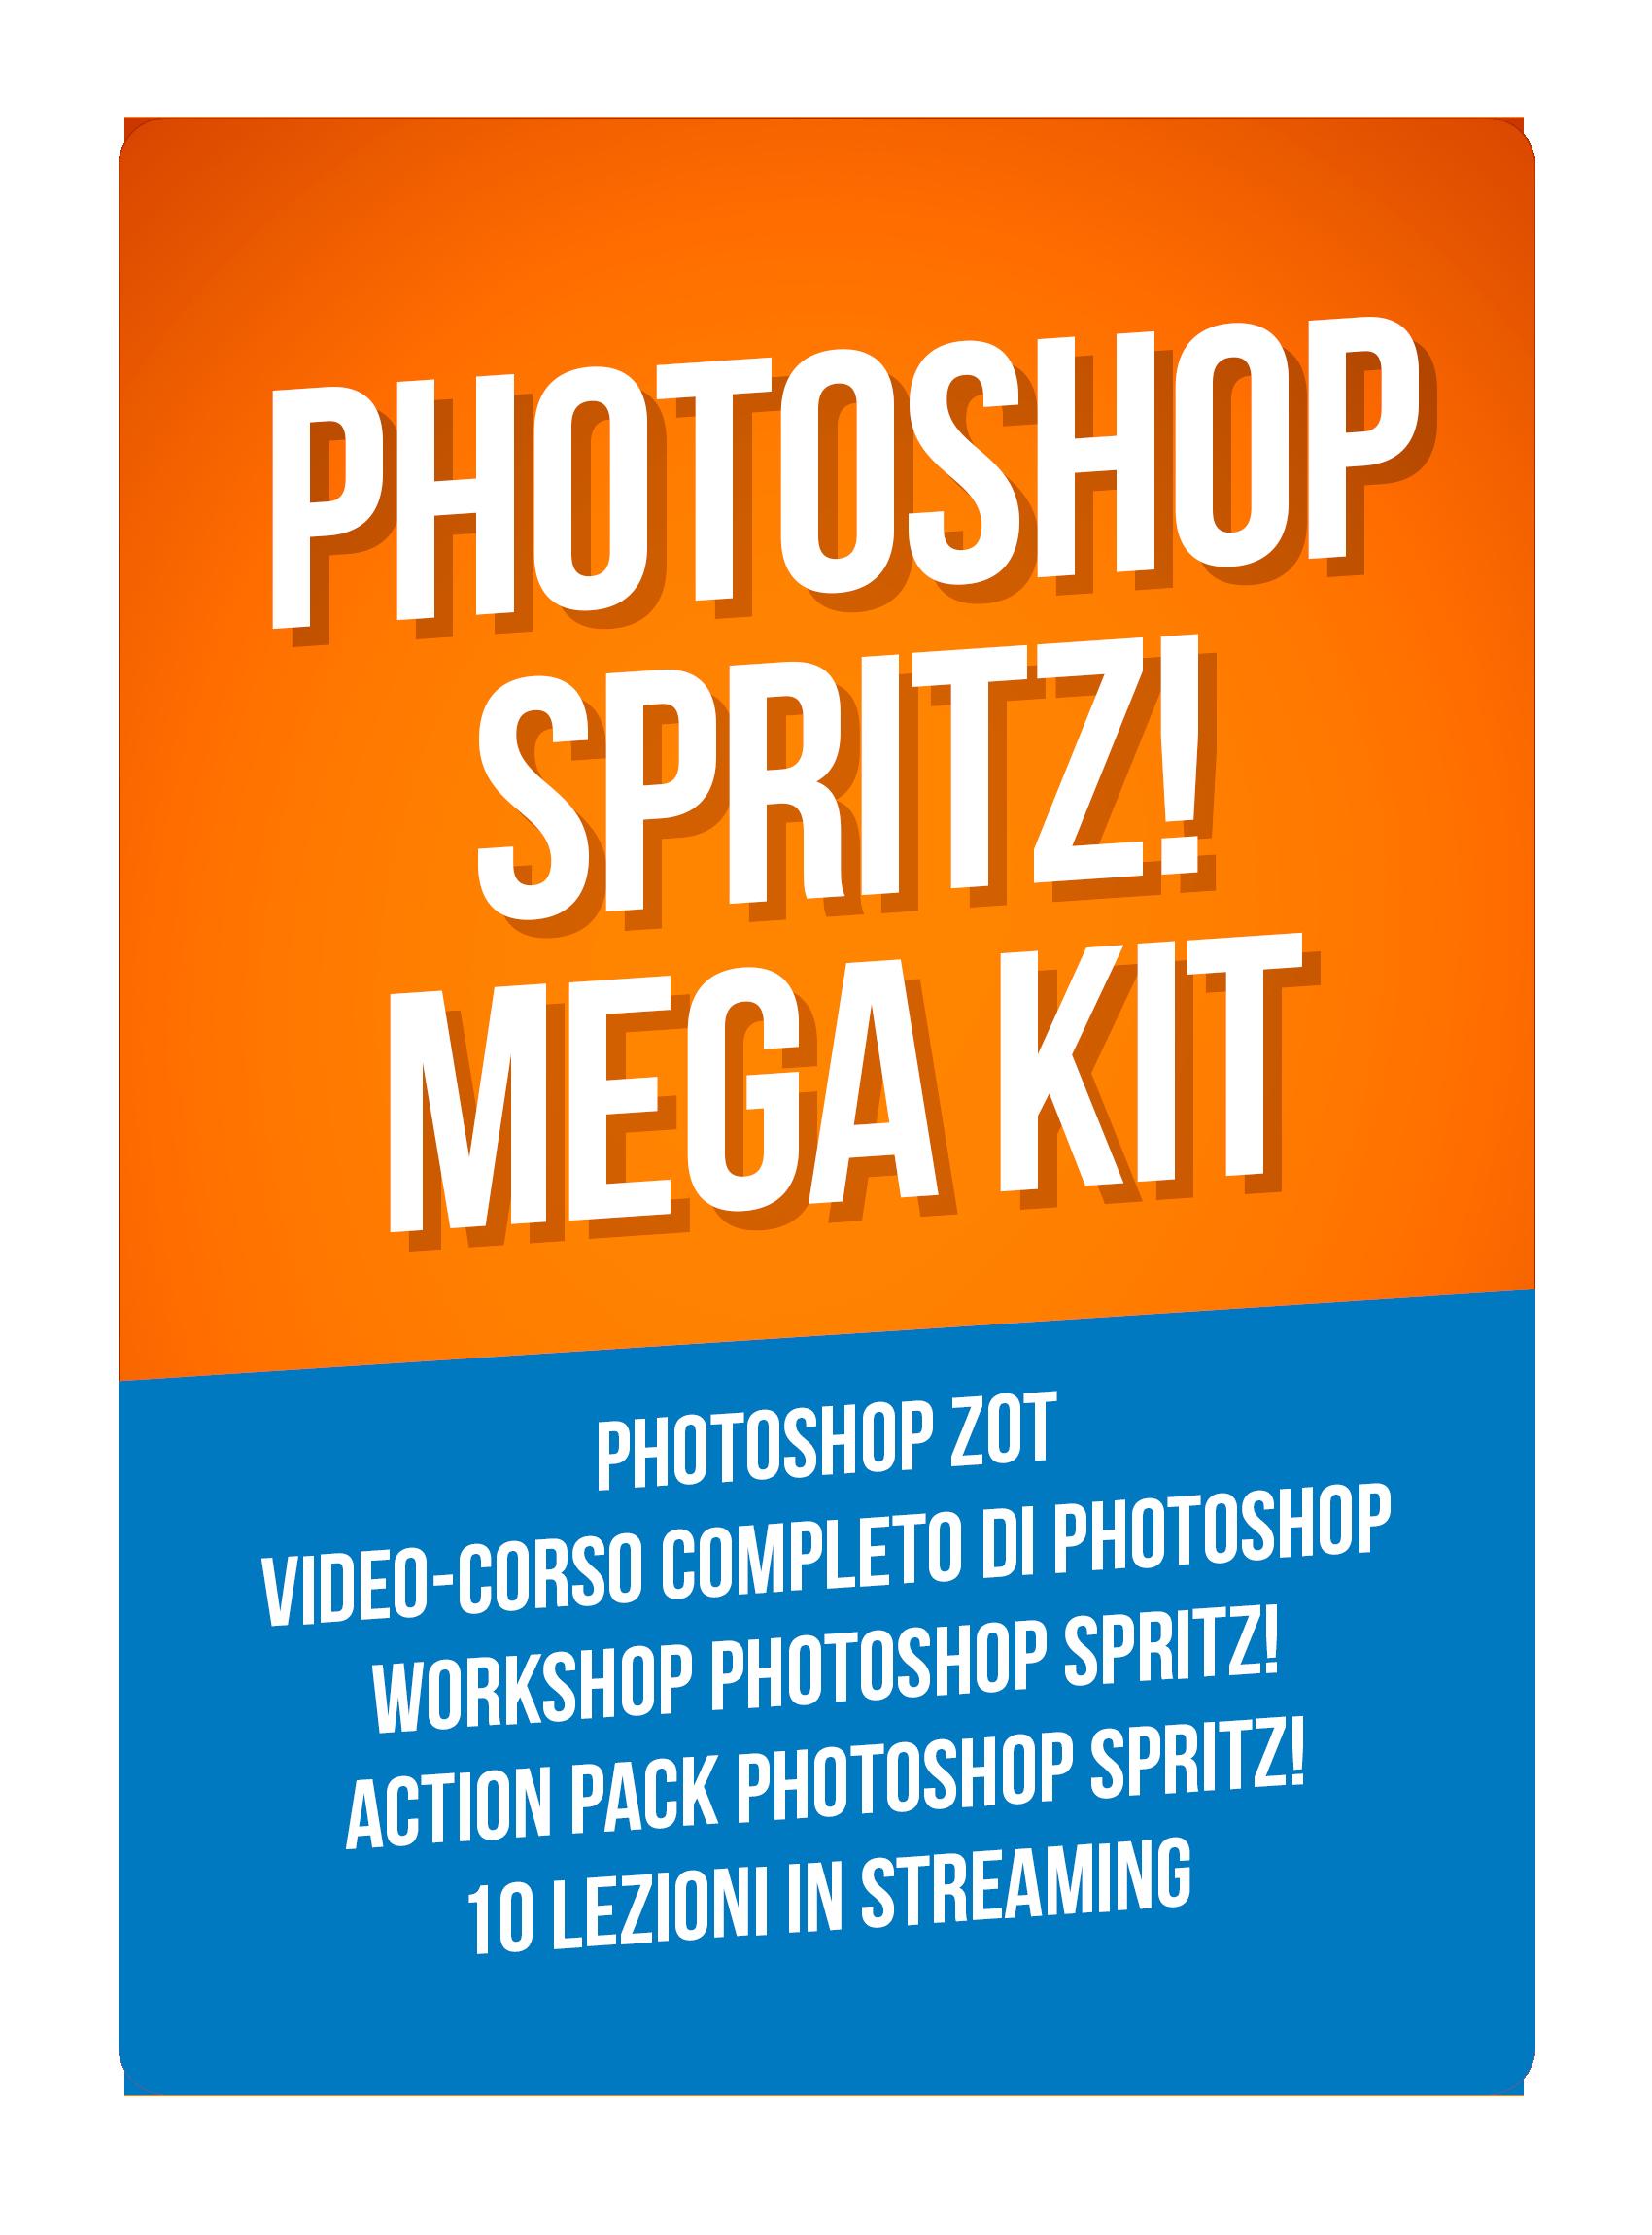 Photoshop SPRITZ! MEGA Kit